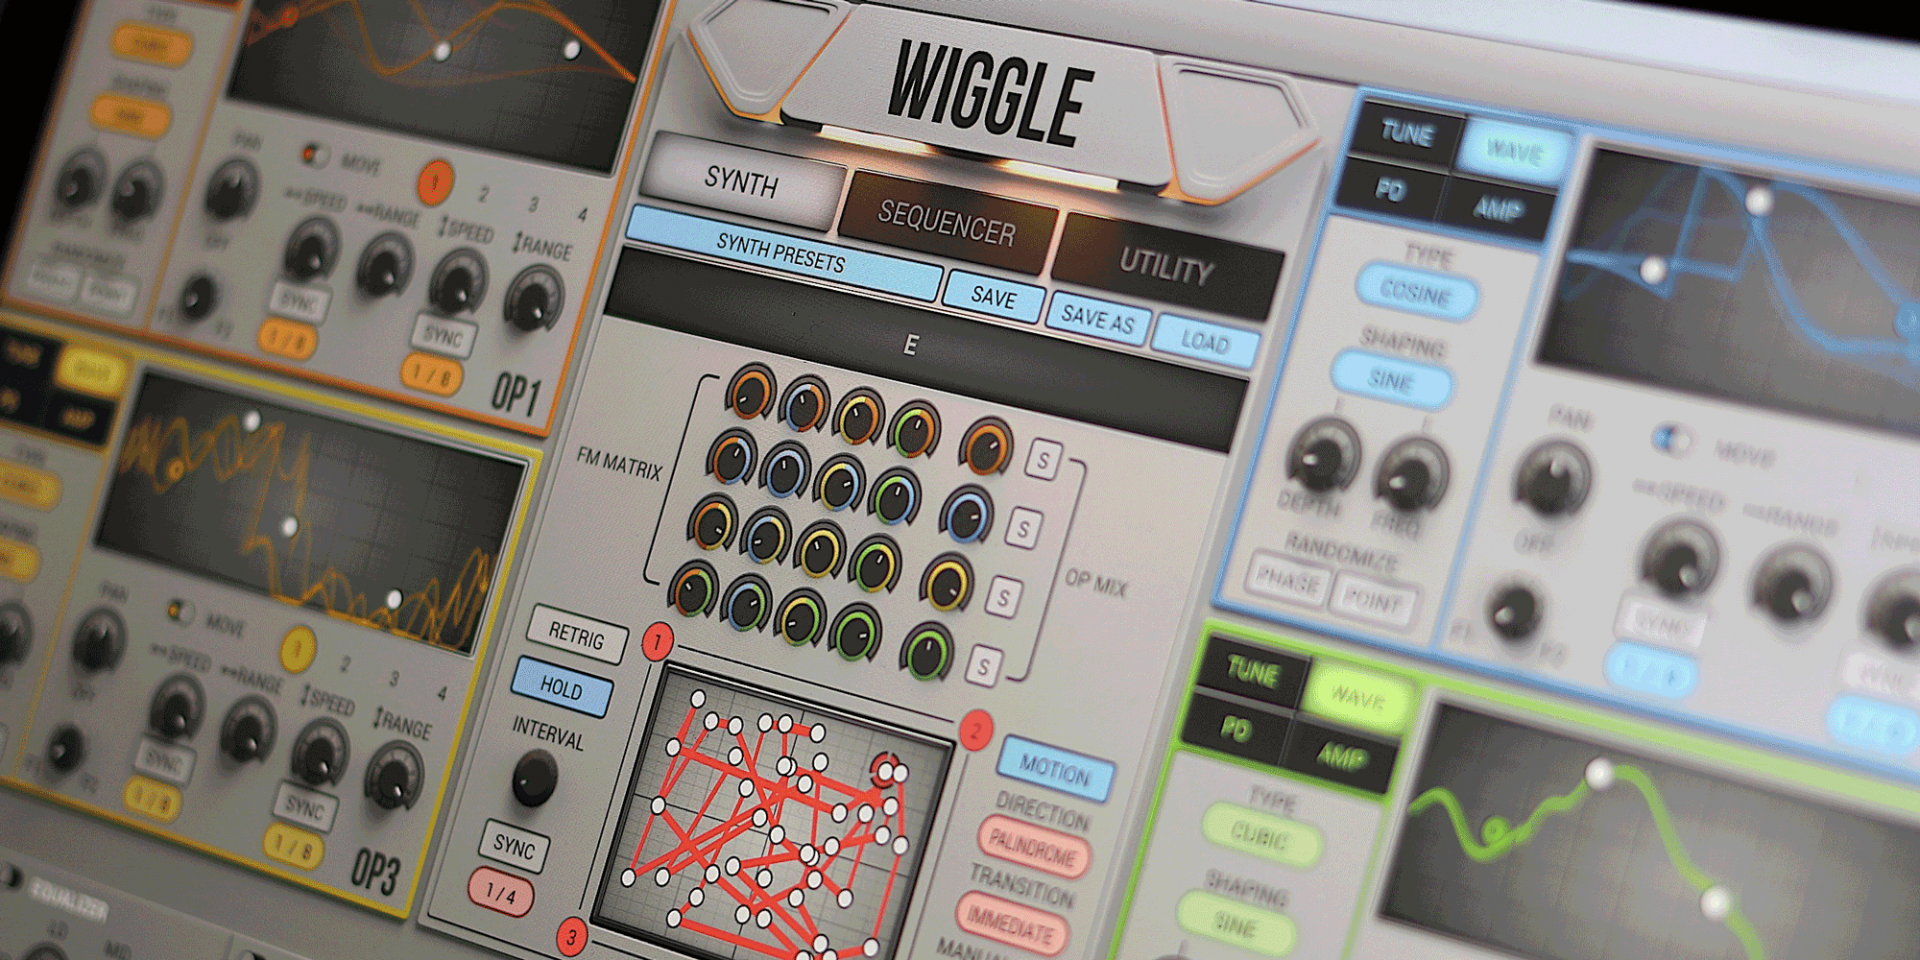 wiggle_mh